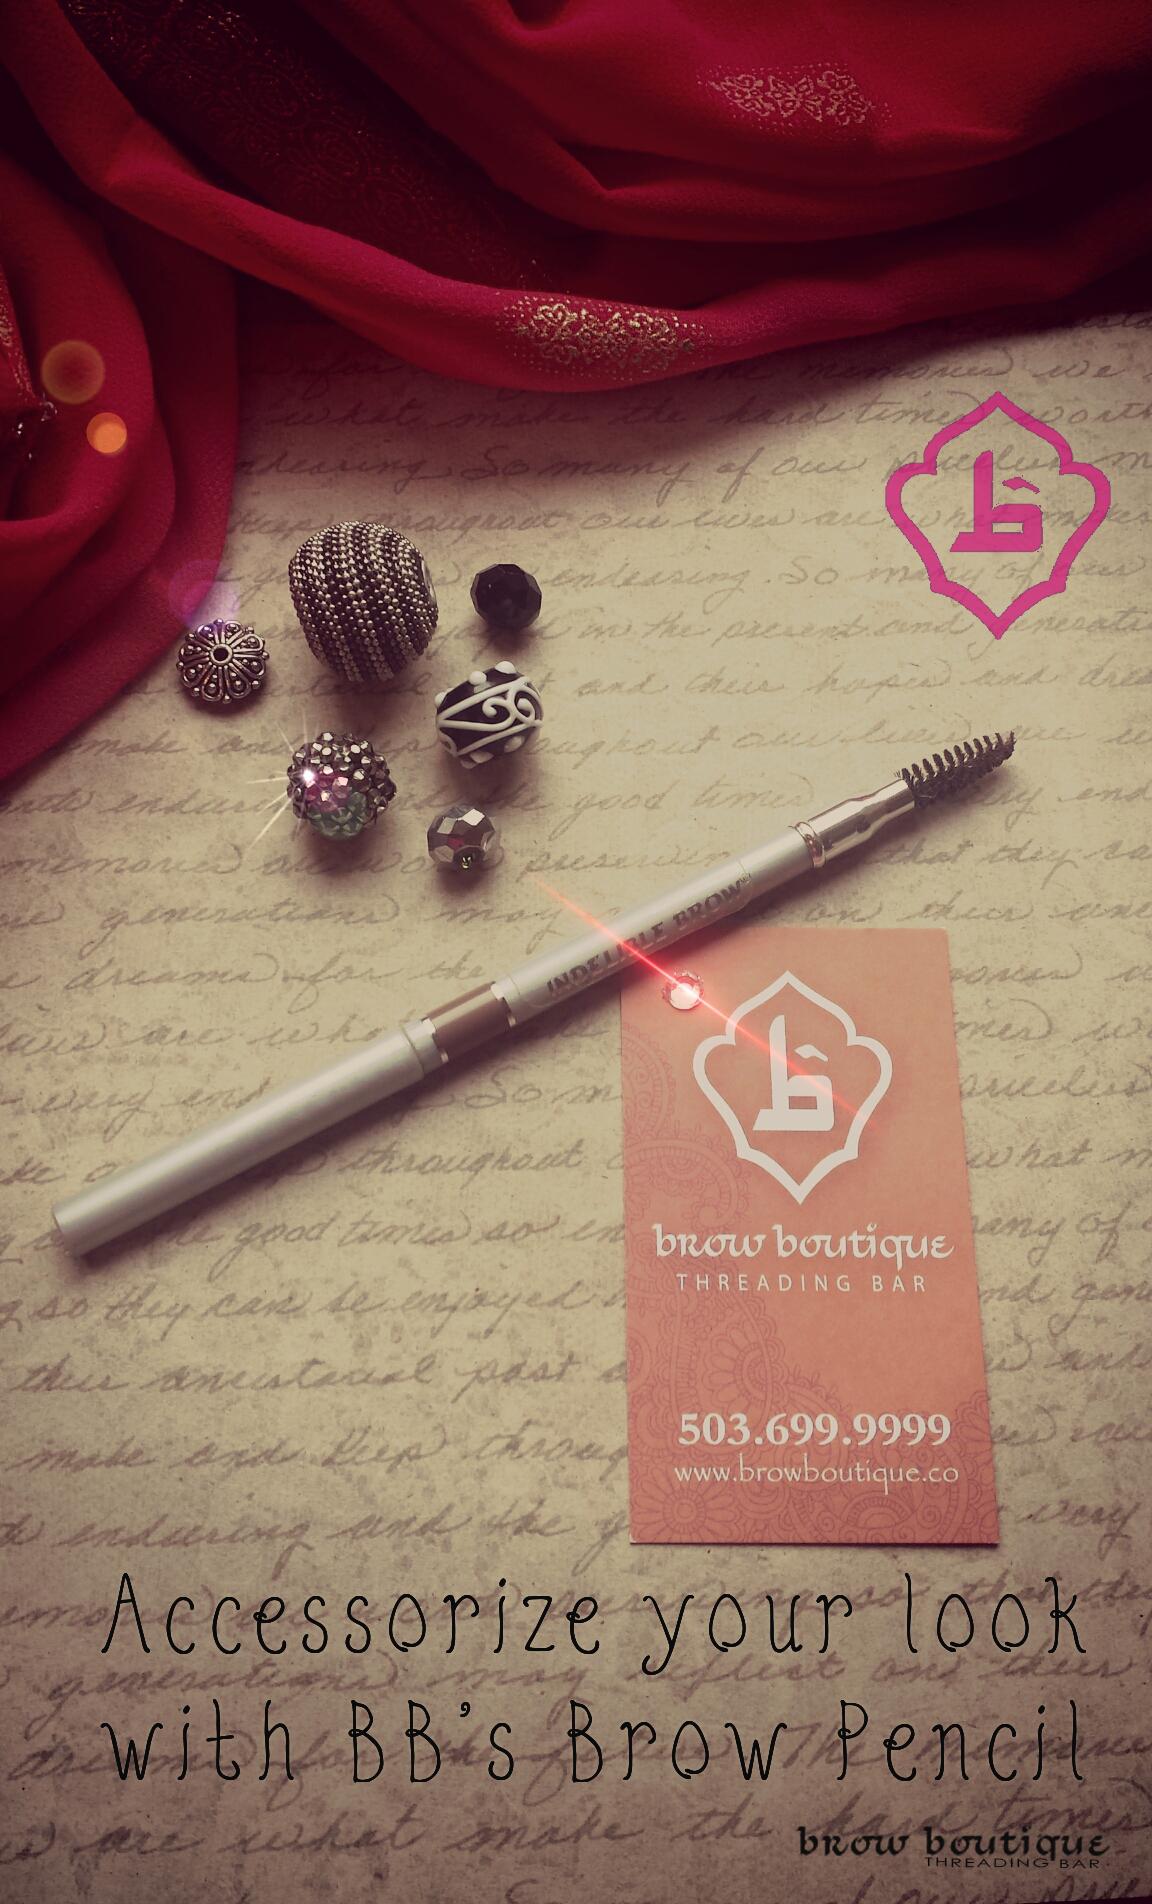 Brow Boutique Threading Bar PDX brow pencil